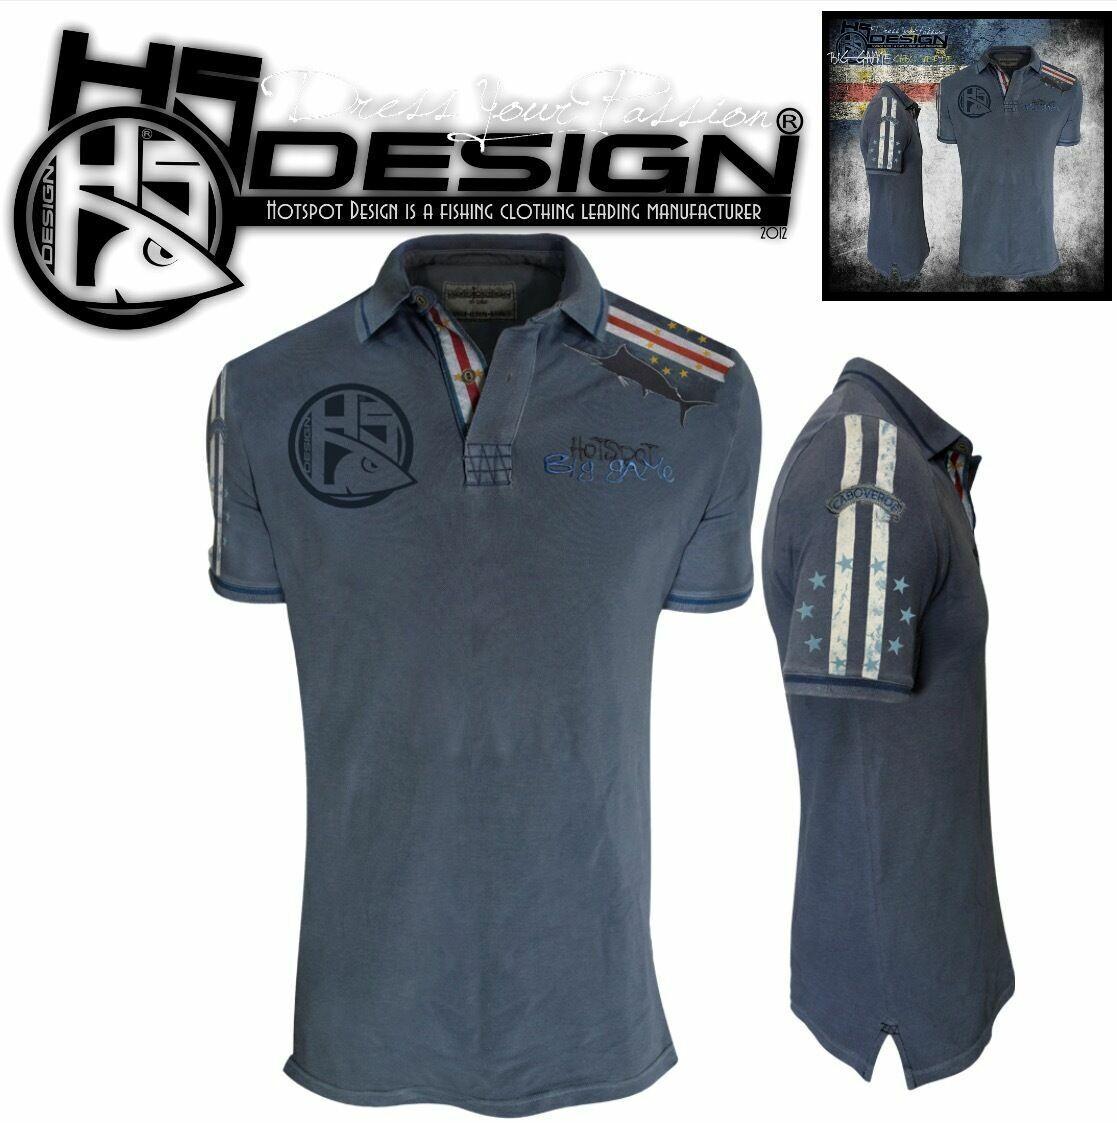 Hot Spot Design polo t-shirt Big Juego  Cabo verde  marca en liquidación de venta